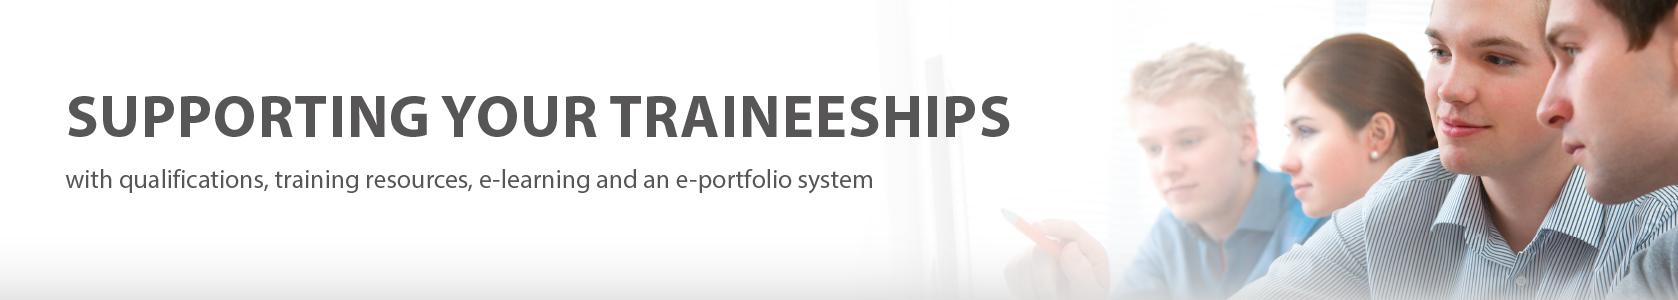 traineeship qualifications